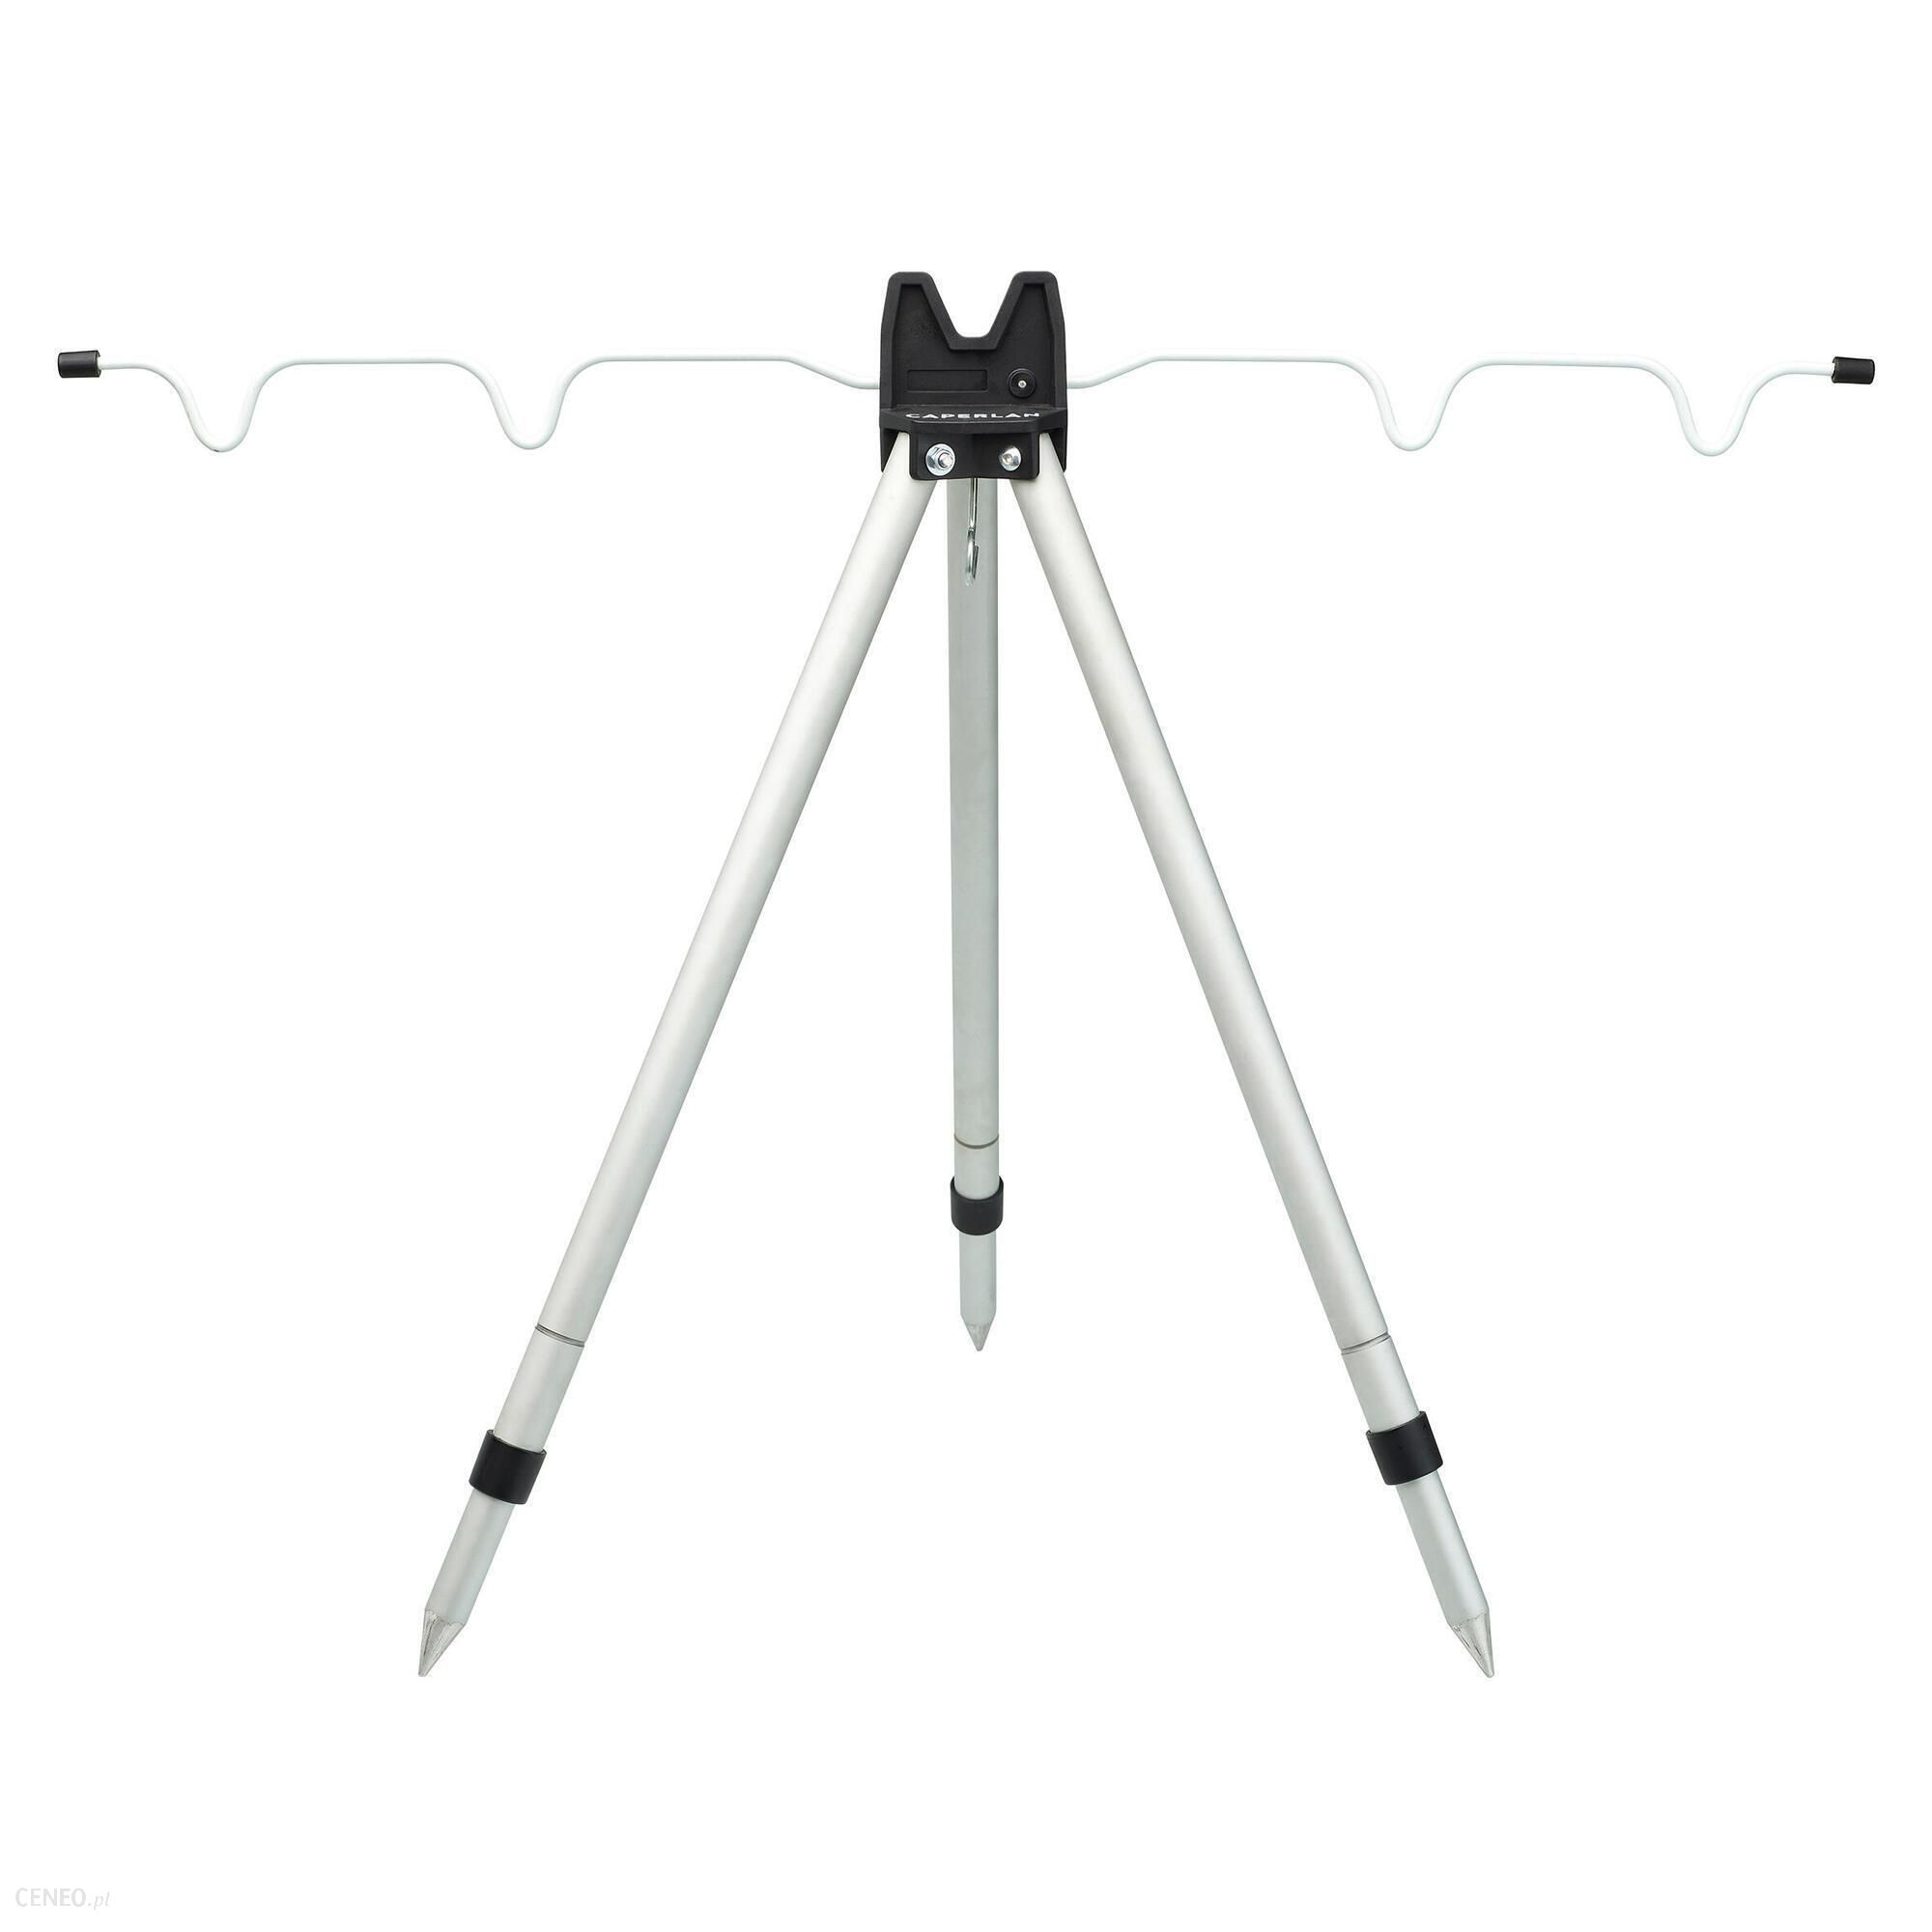 Caperlan Podpórka Teleskopowa Pod Wędkę Sw Tpod Pm